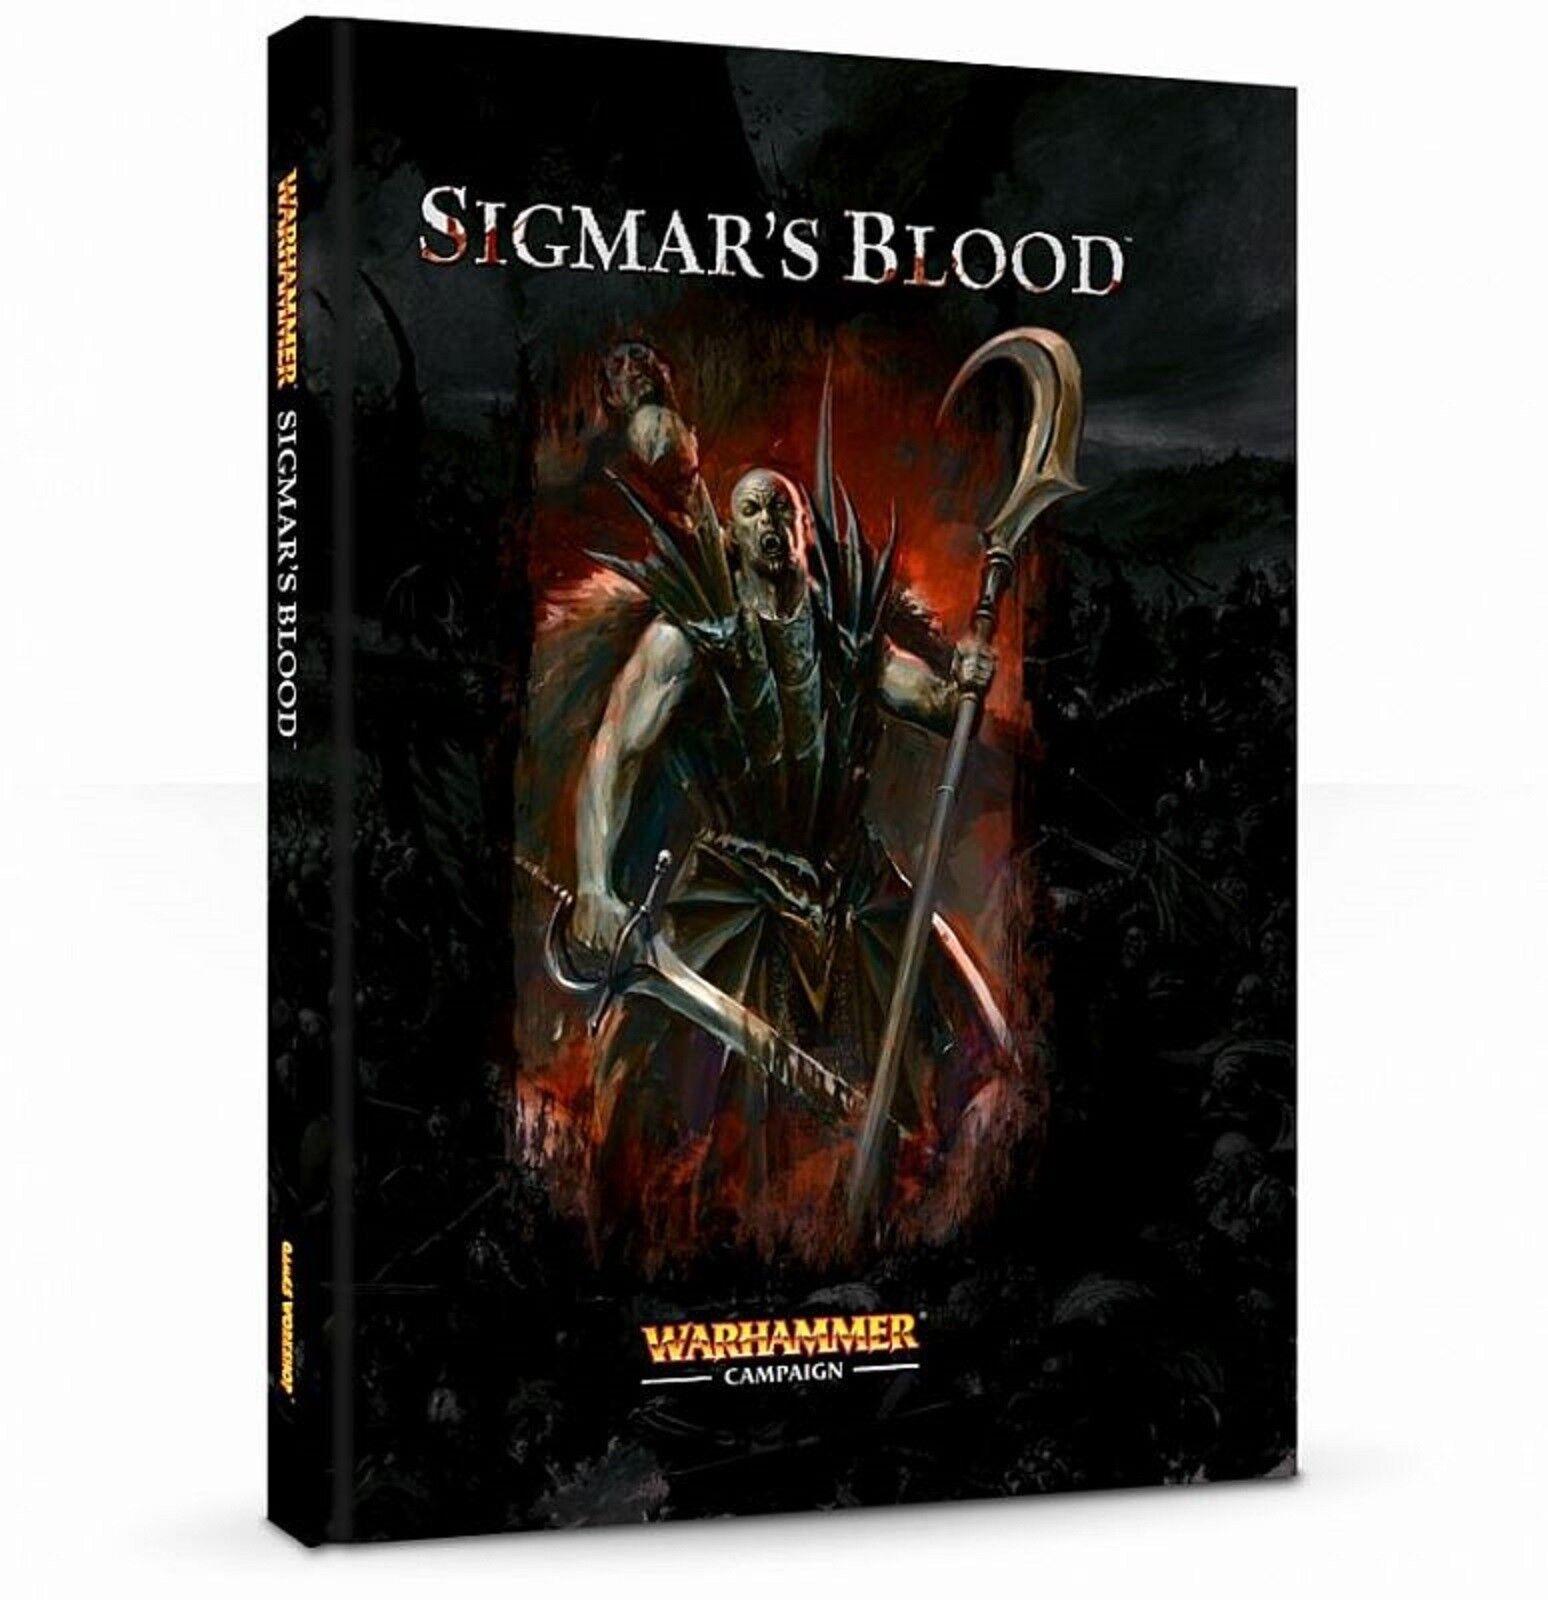 Games Workshop Sigmar's Blood Hardcover Campaign Book